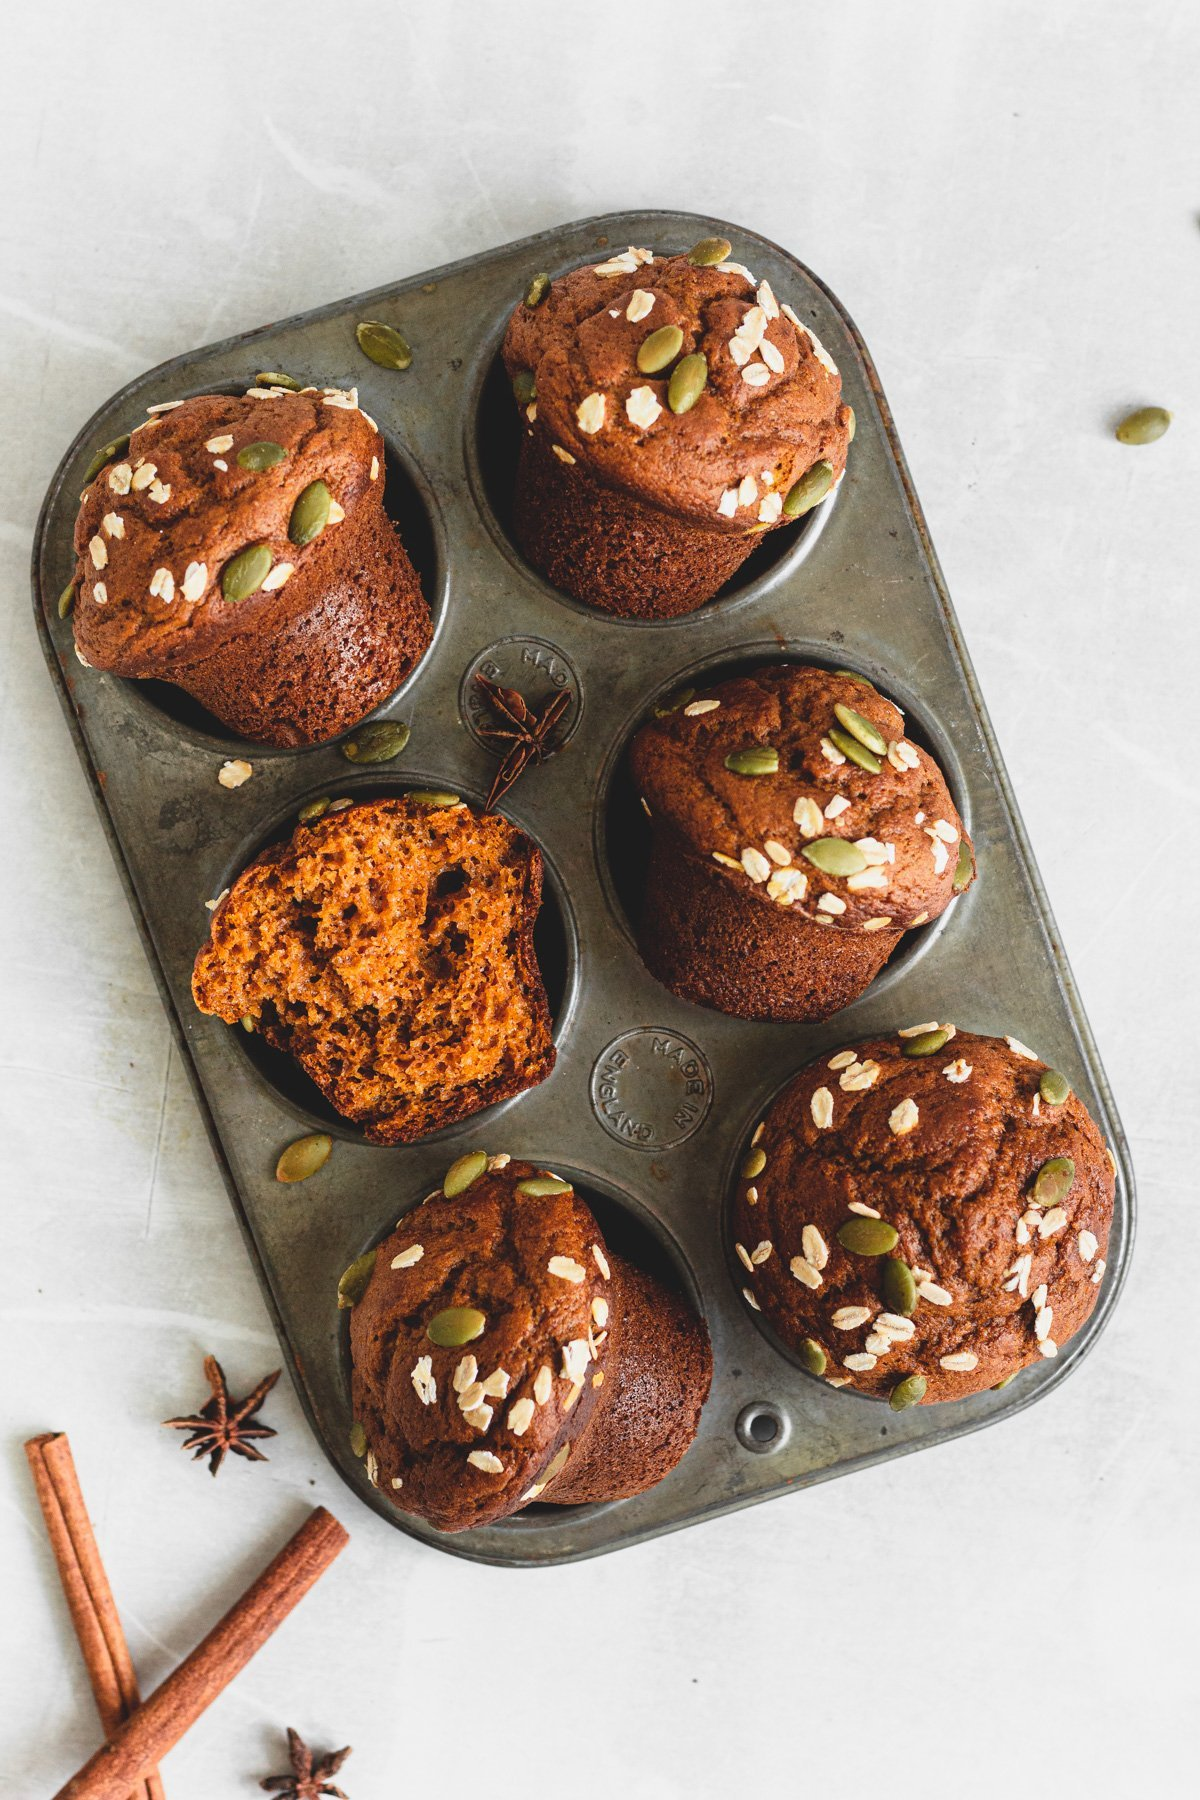 6 sourdough pumpkin muffins in muffin tin, from overhead